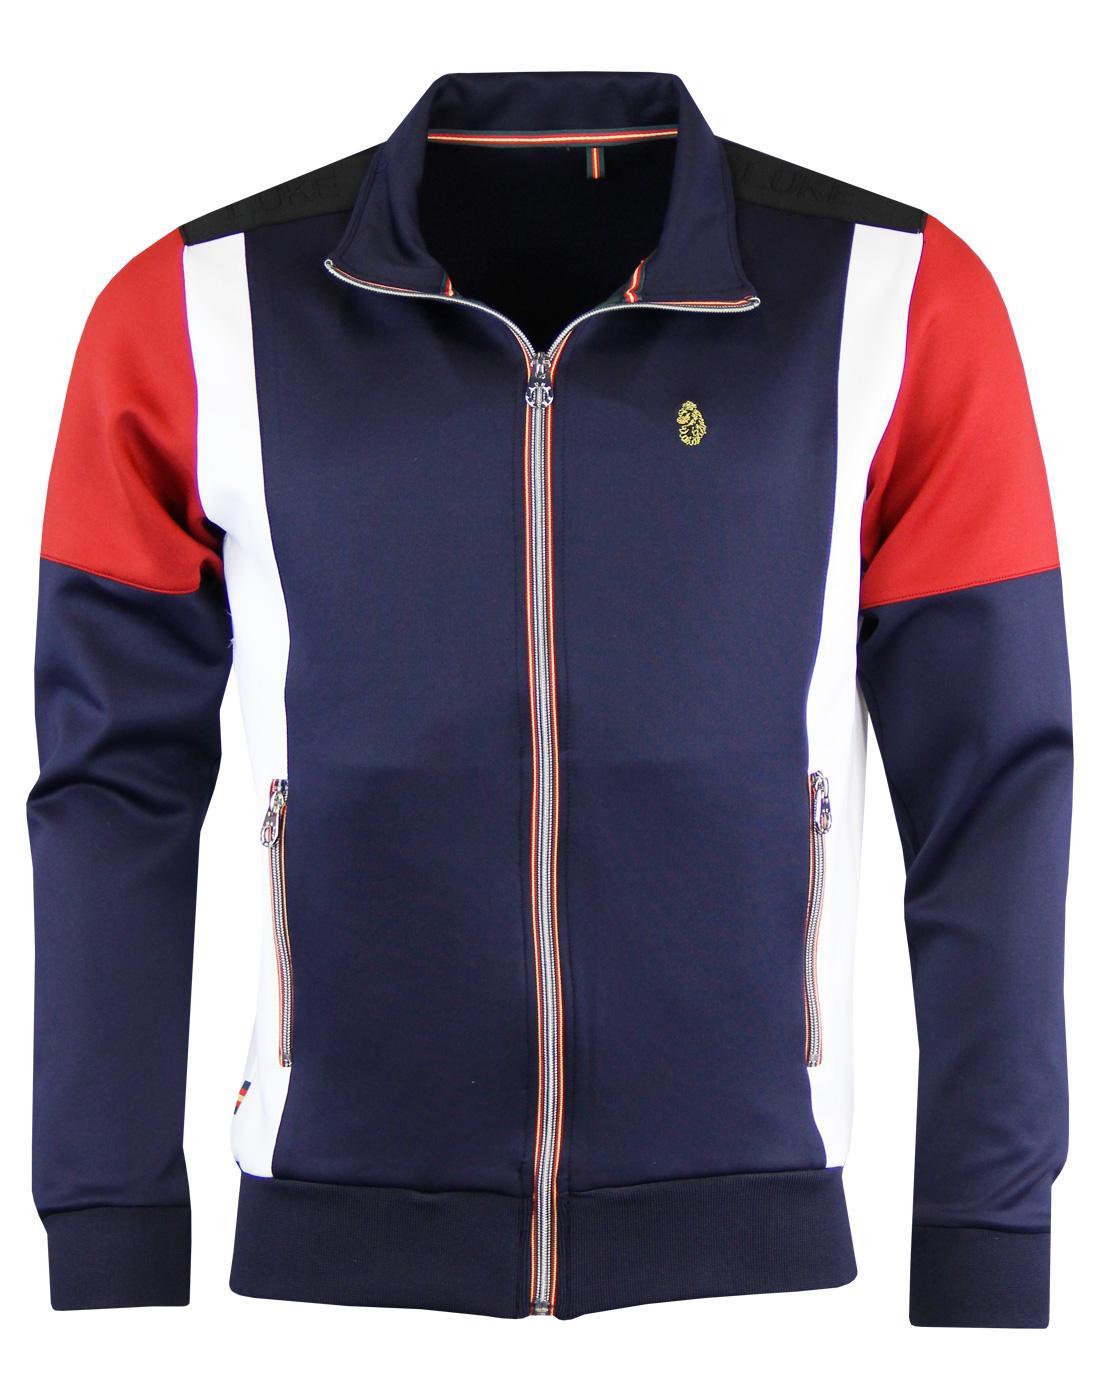 Thorpe LUKE 1977 Retro Colour Block Track Jacket